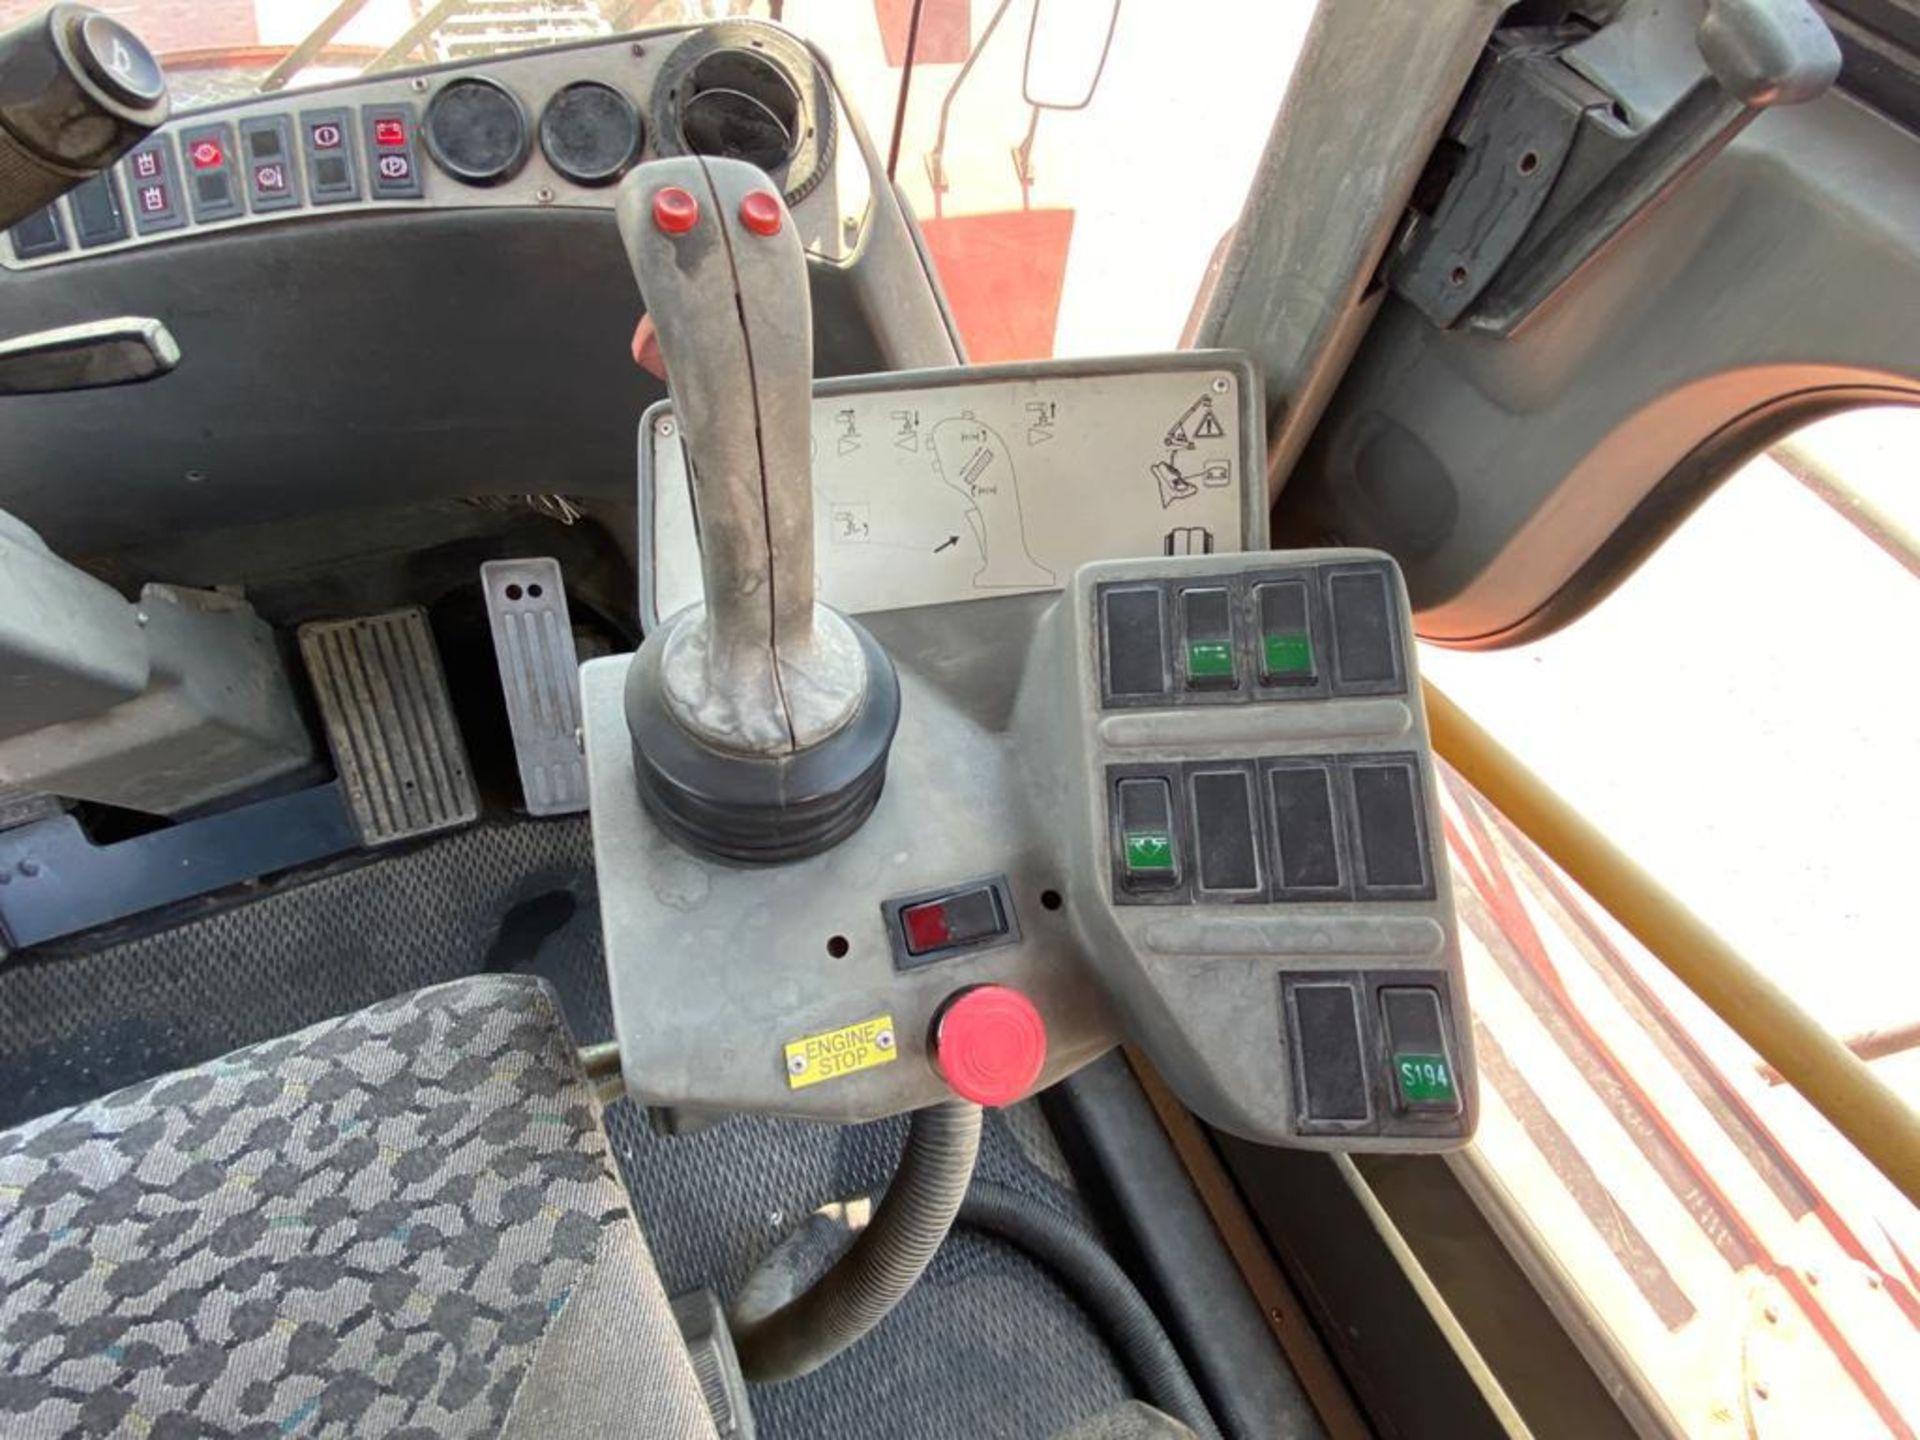 Reach Stacker marca Kalmar, año 2004, modelo DRS4531-55, No de serie T341140079 - Image 41 of 57